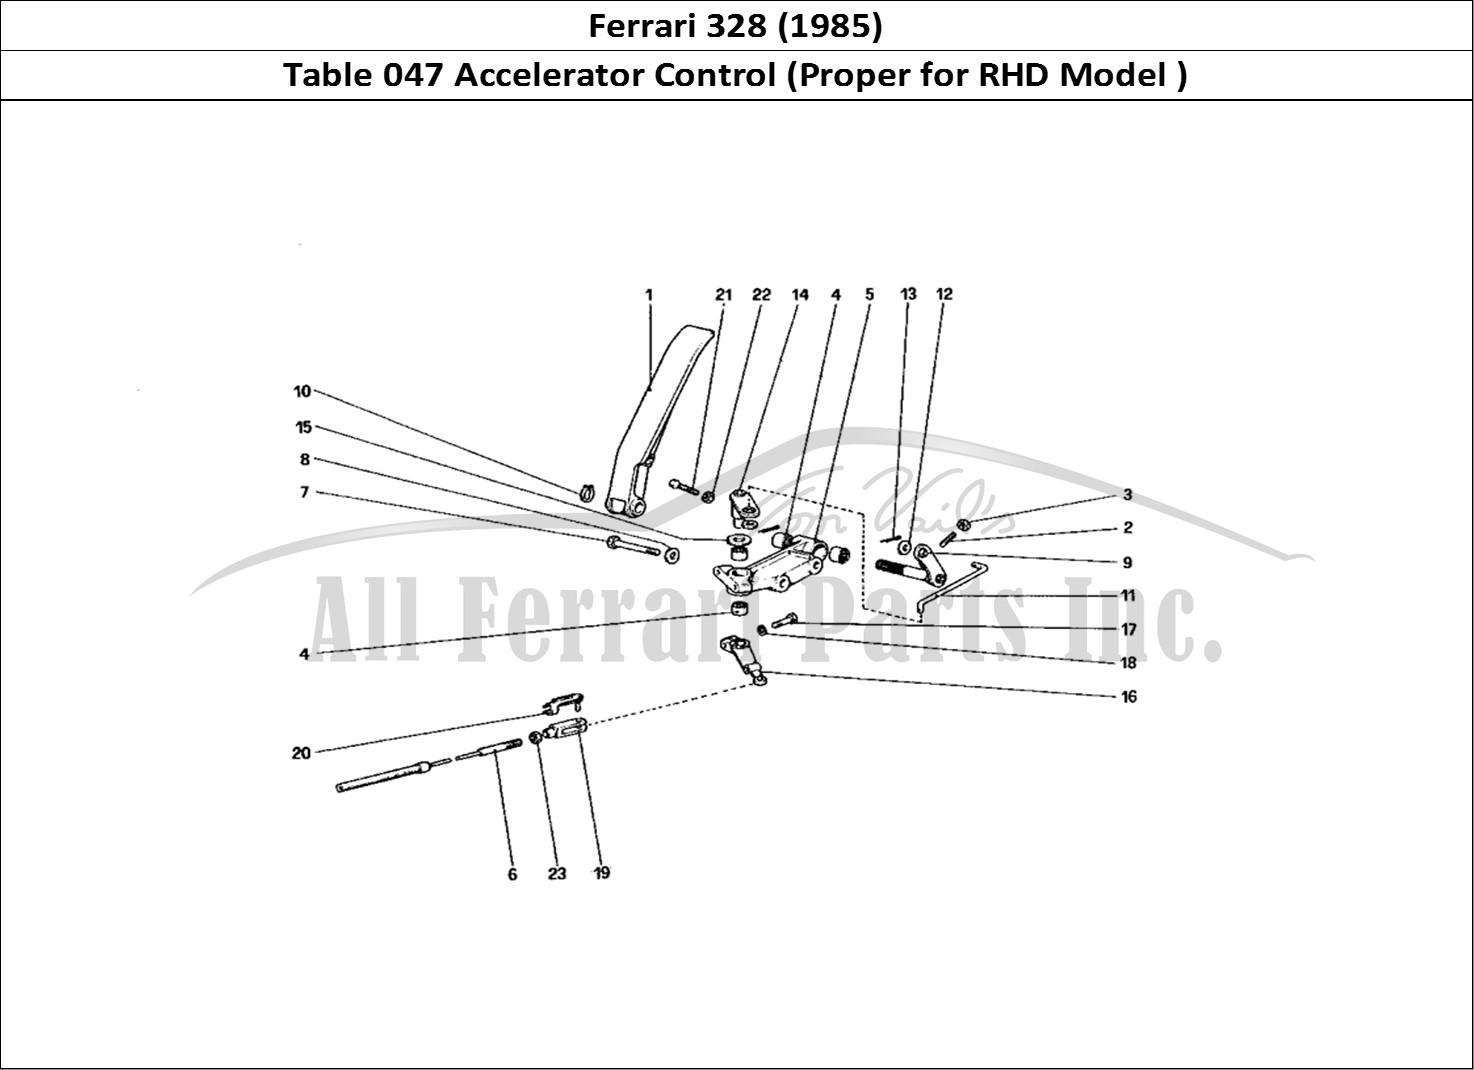 Buy original Ferrari 328 (1985) 047 Accelerator Control